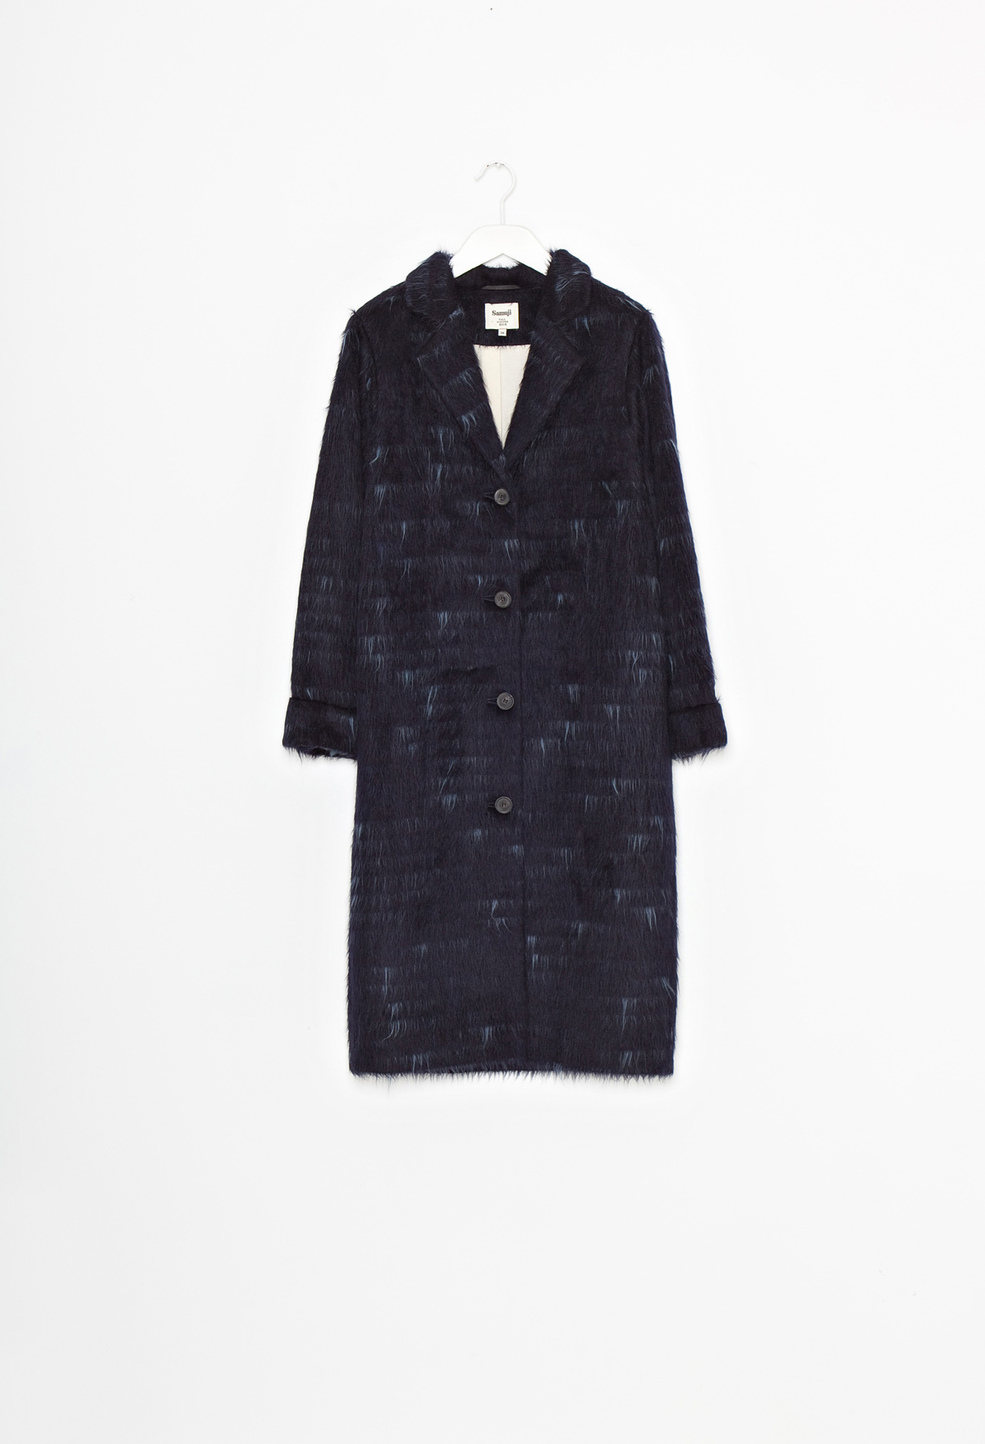 Blaine Coat